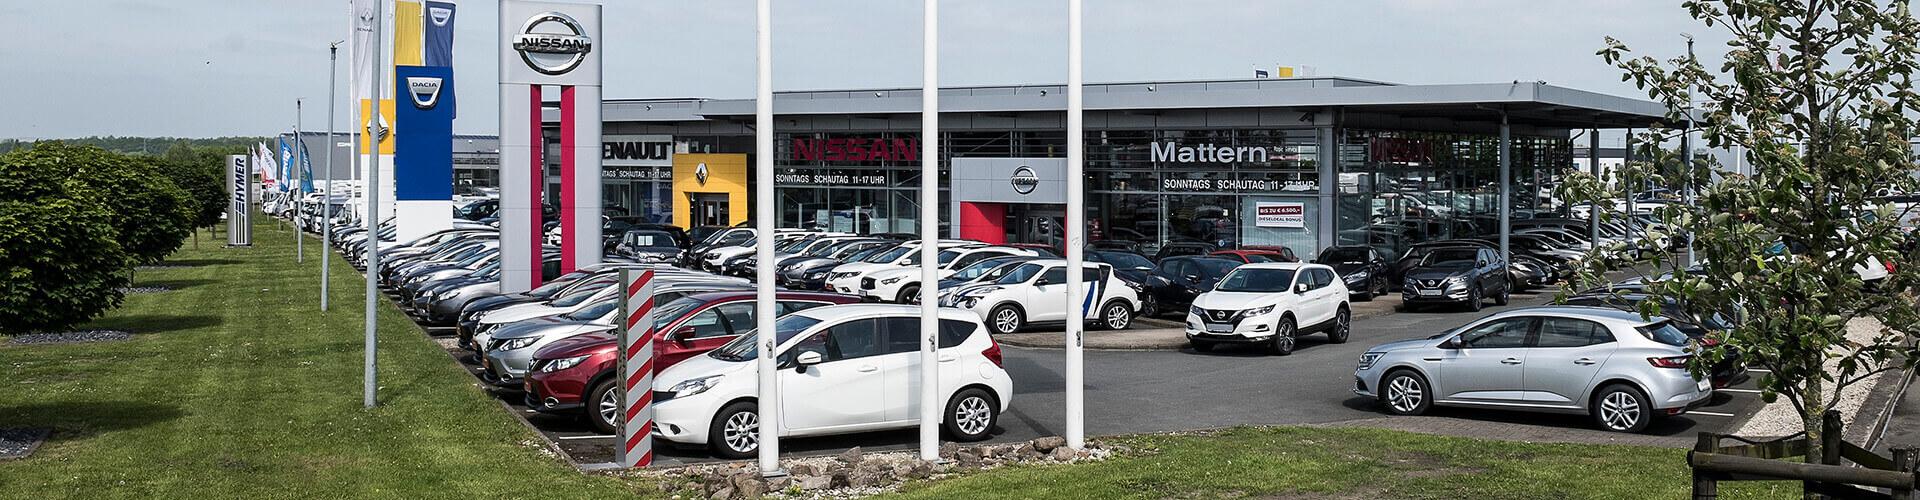 Auto Mattern - Standort Lange Wand